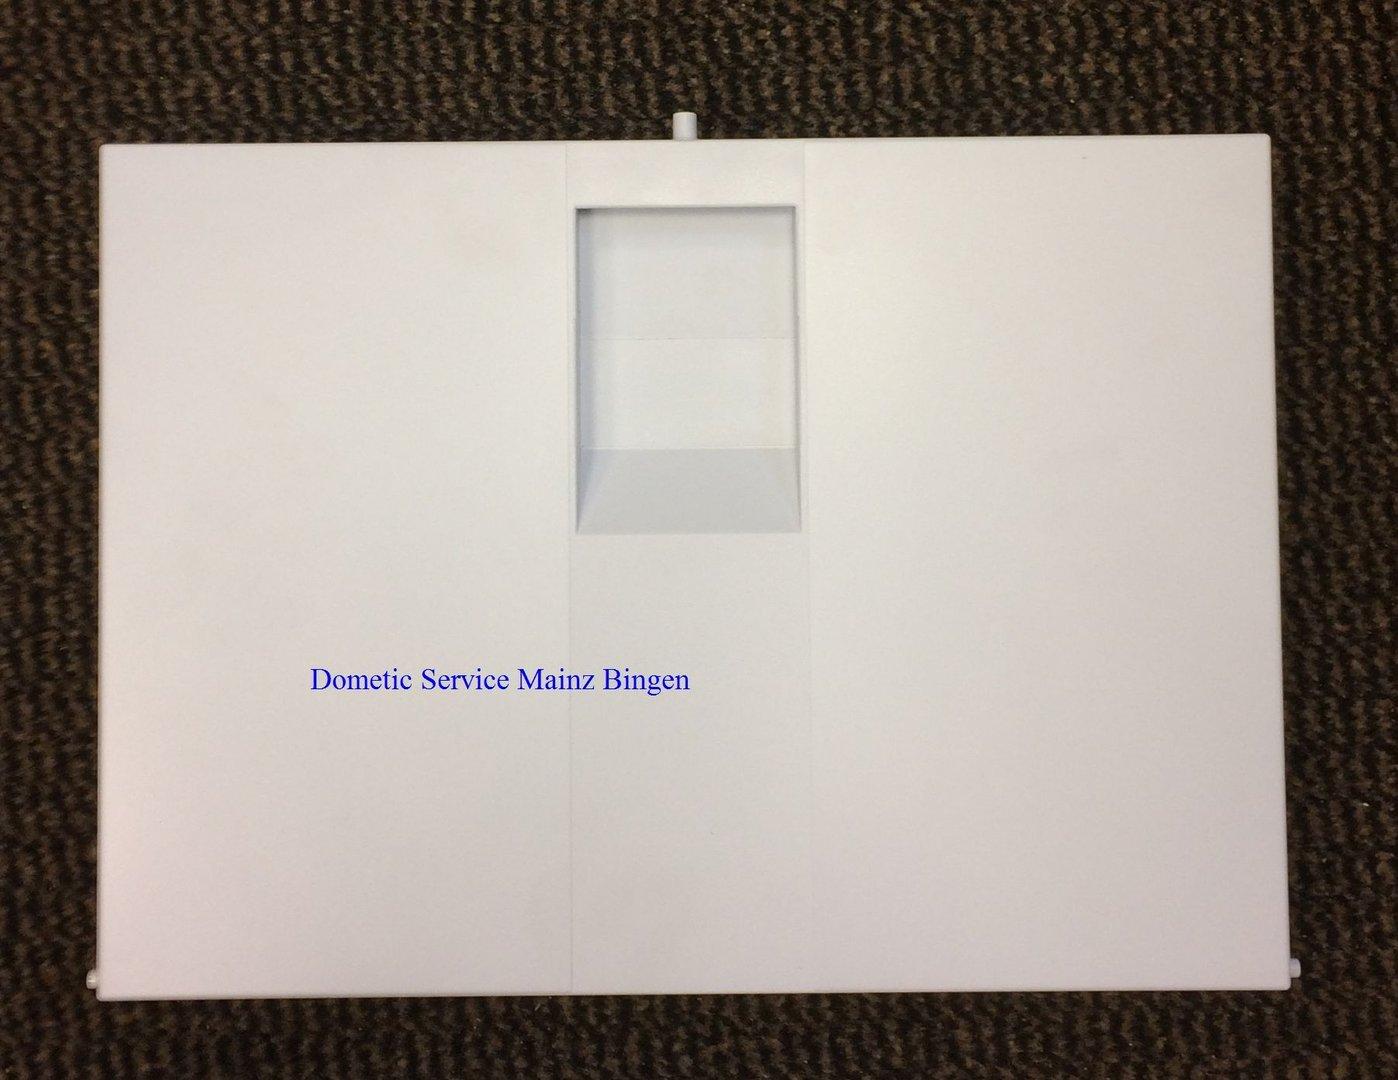 Kühlschrank Dometic : Kühlschrank dometic minibar hipro liter online bei hÄfele